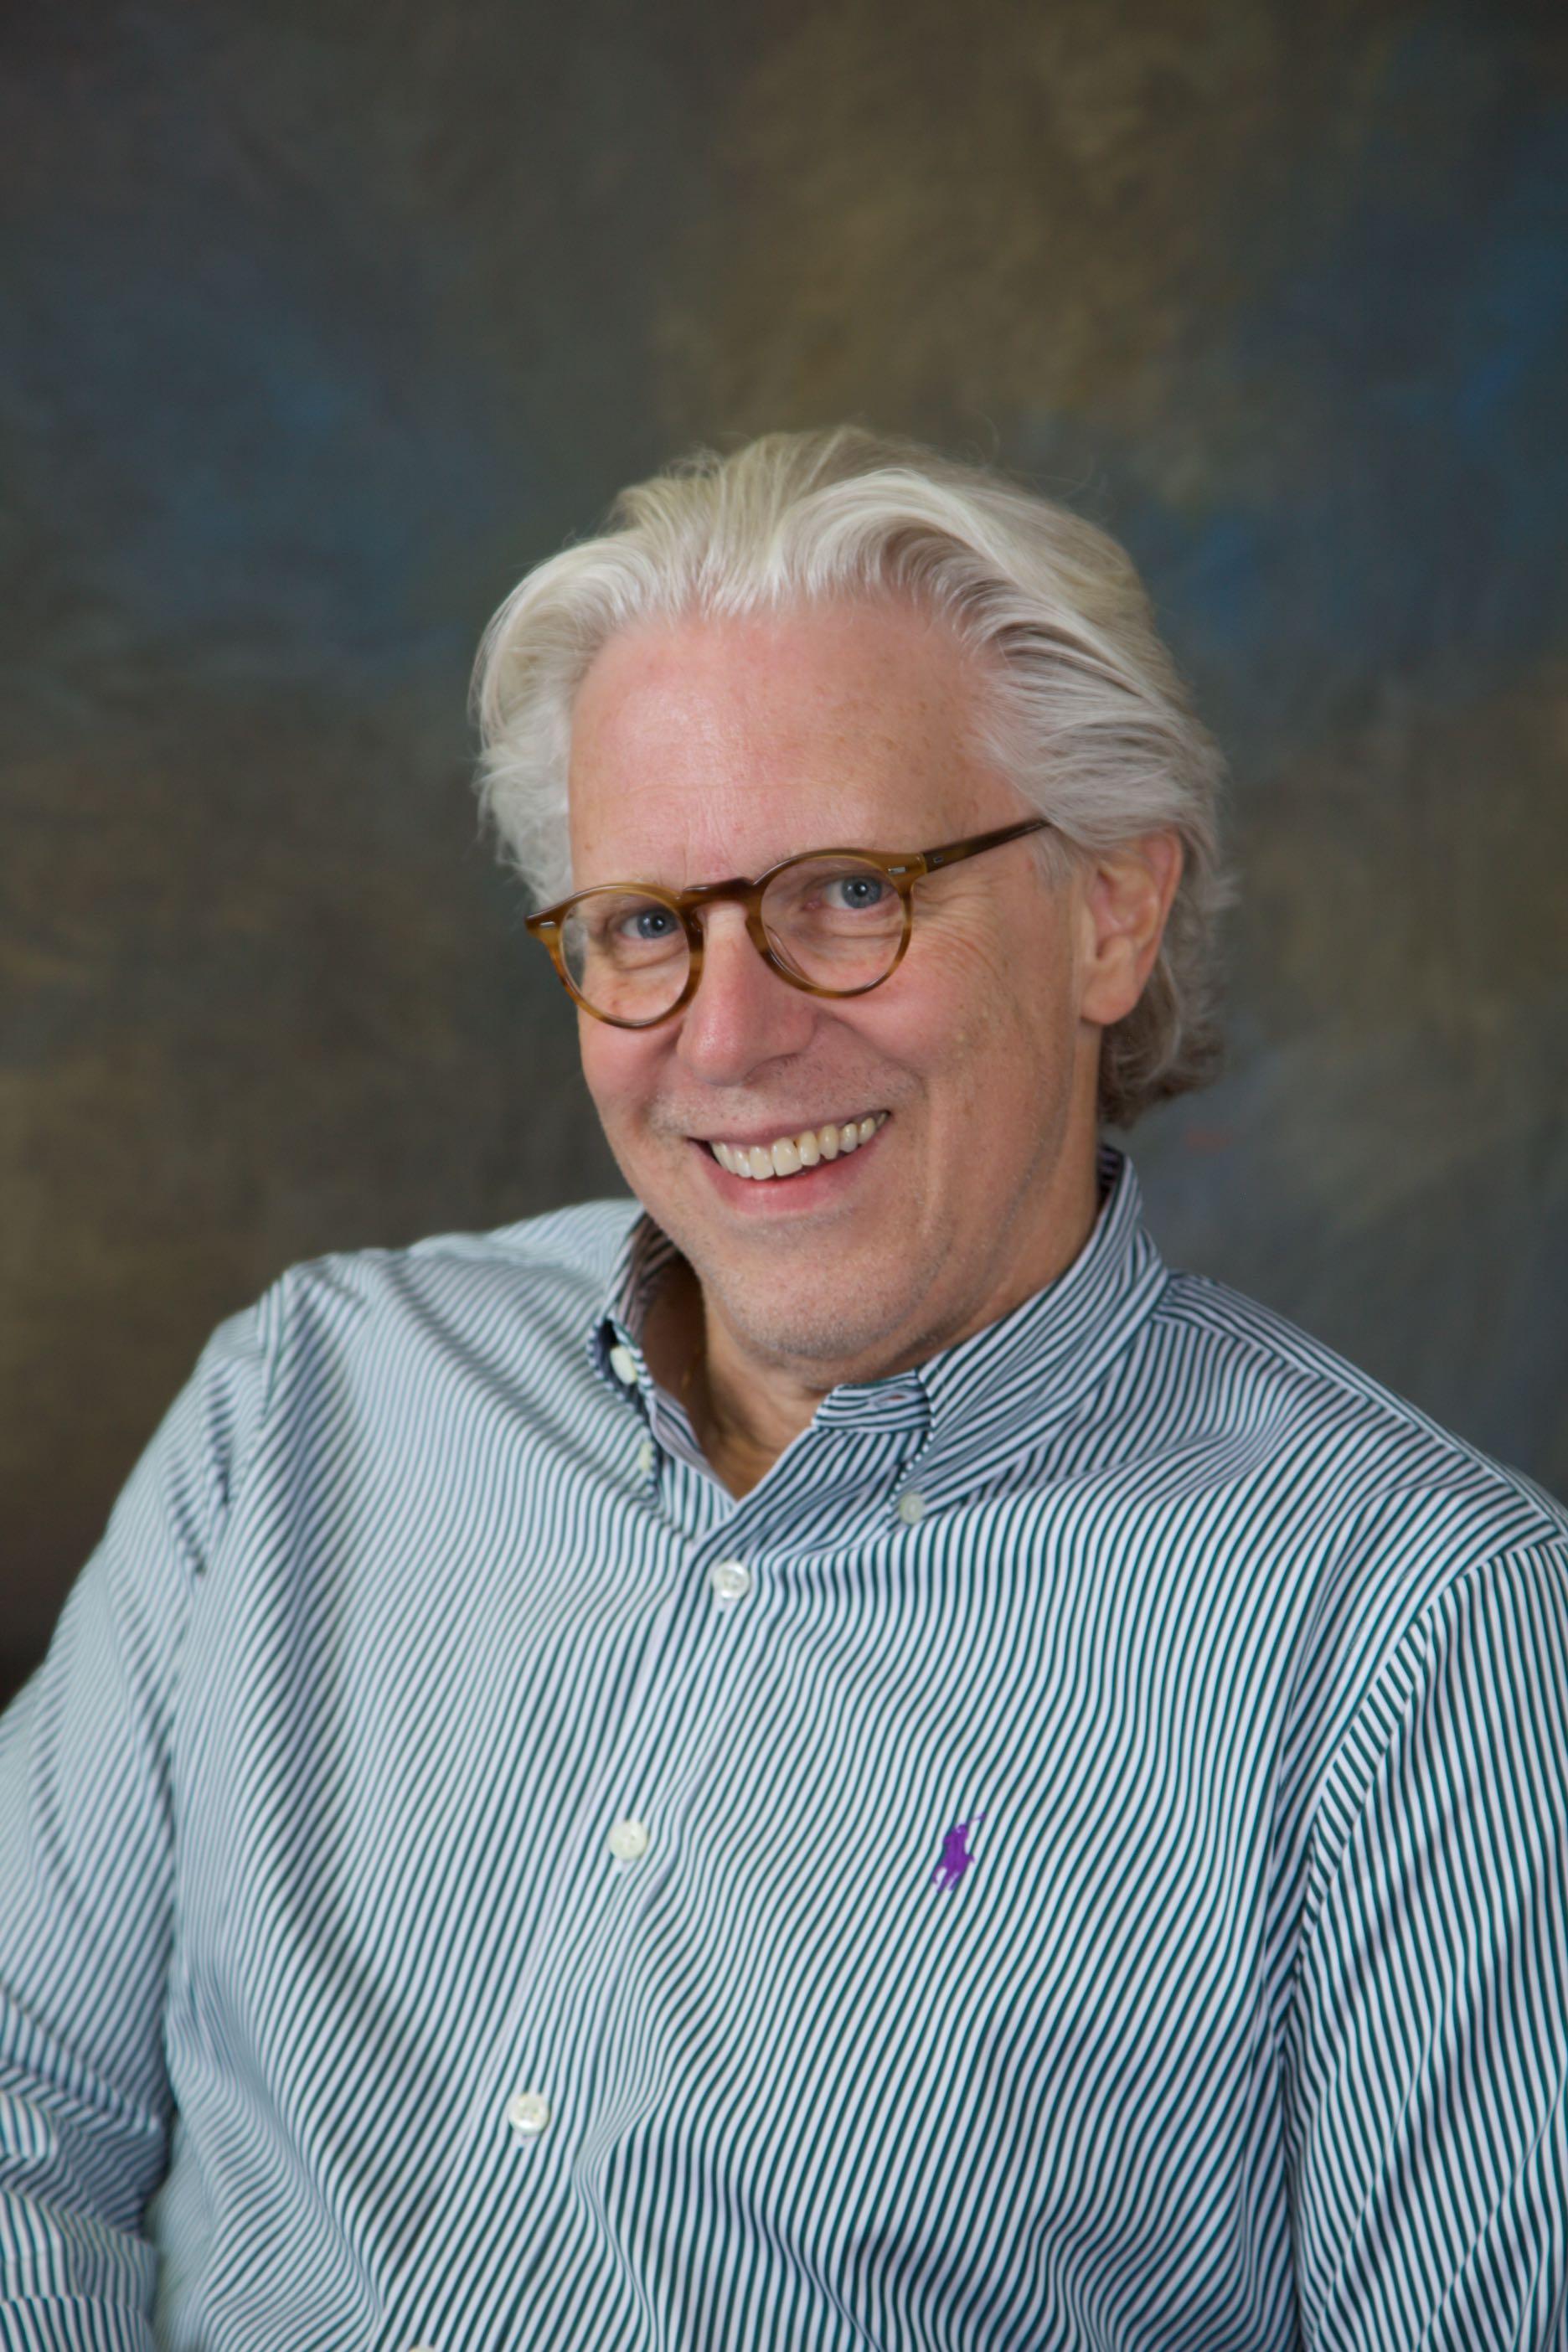 Robert Zuskin, Founder of Jet Perspectives